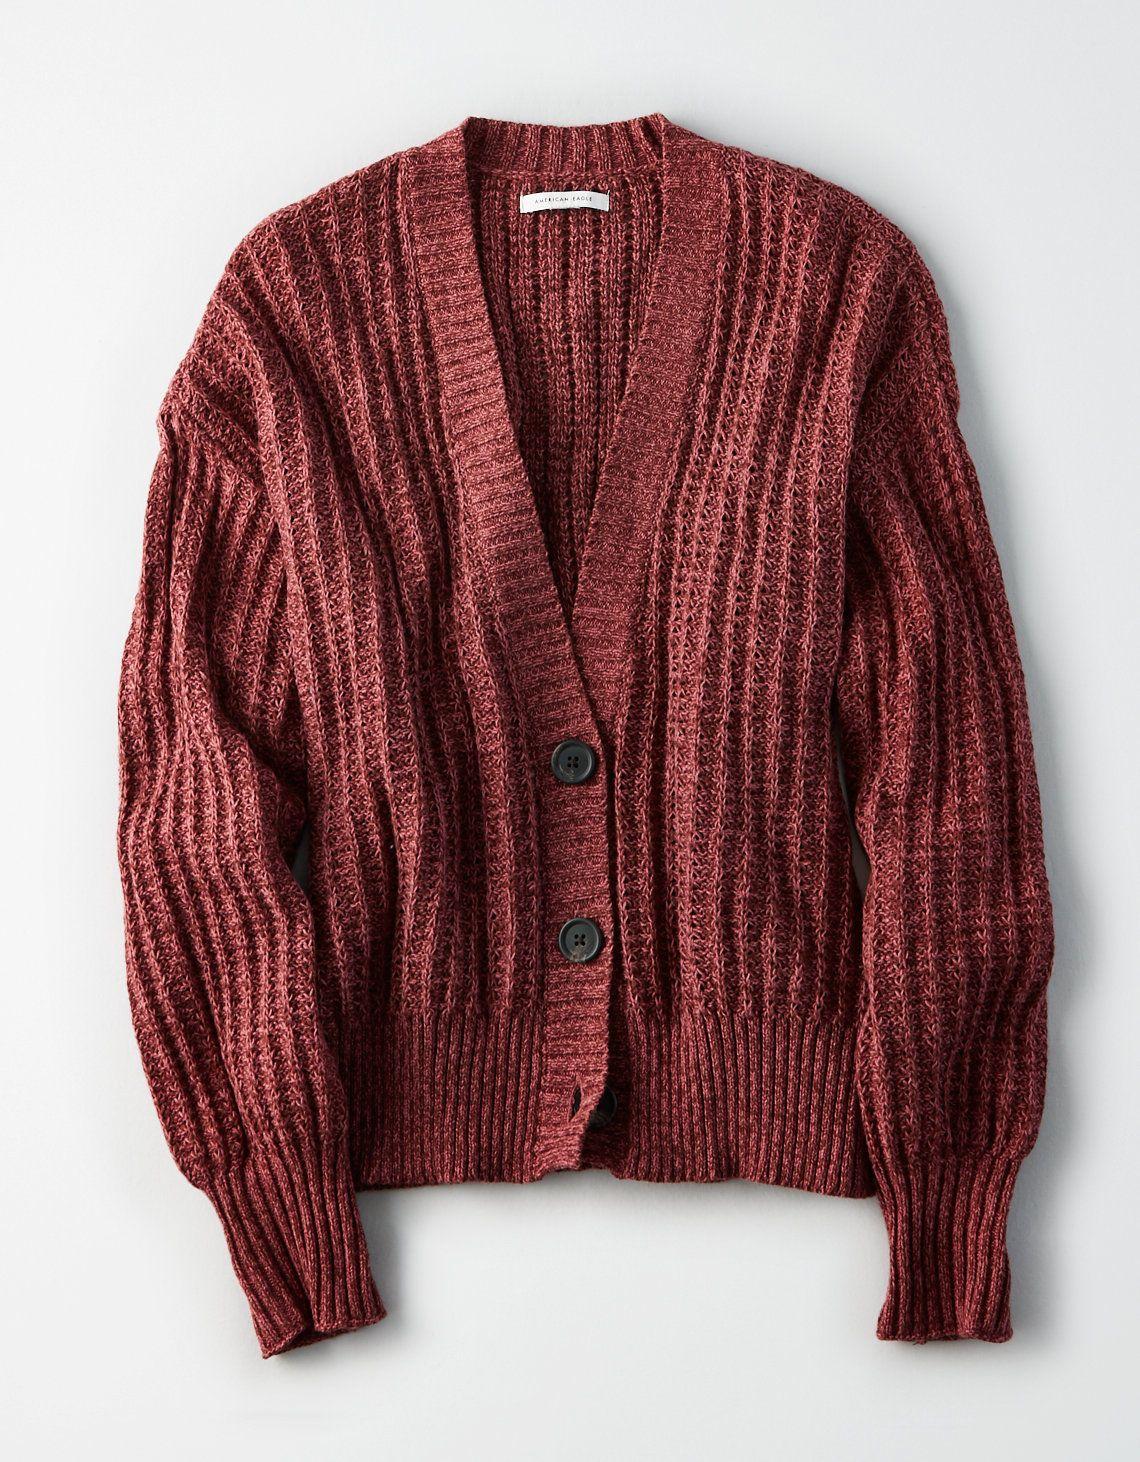 Mens Sweatshirts : Popular Single Product,Women Jeans